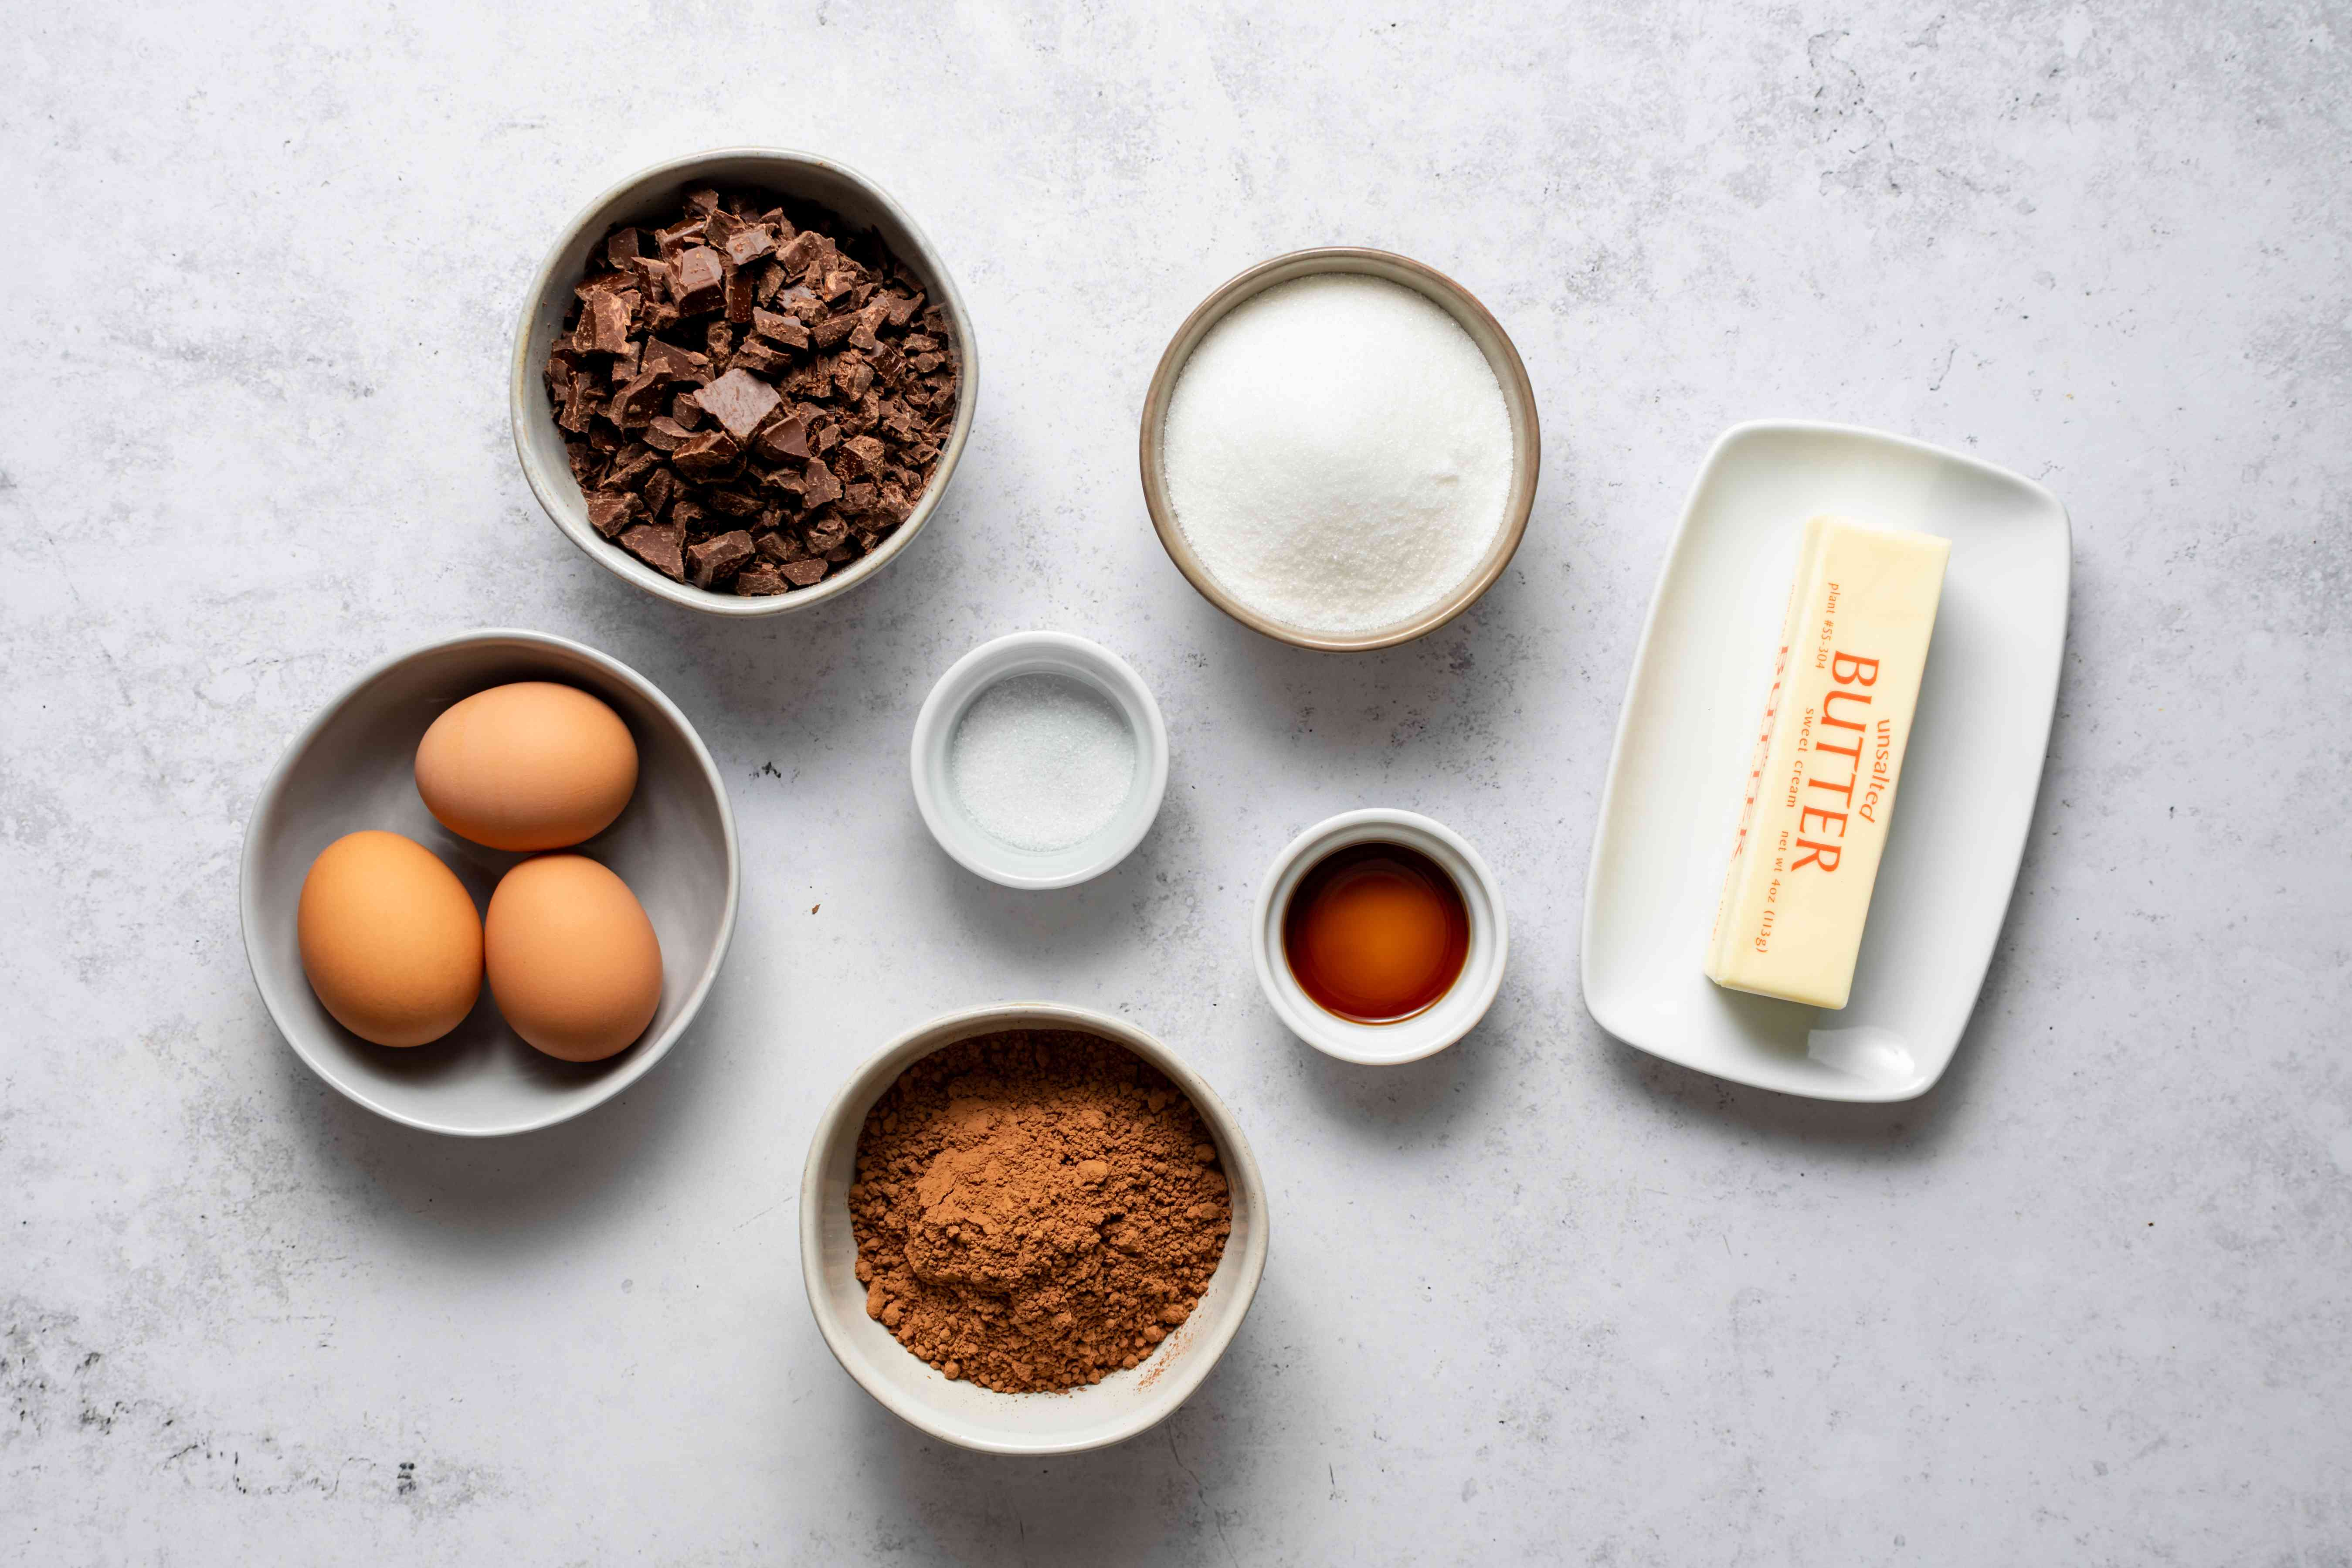 Gluten-Free Chocolate Cake With Chocolate Glaze ingredients